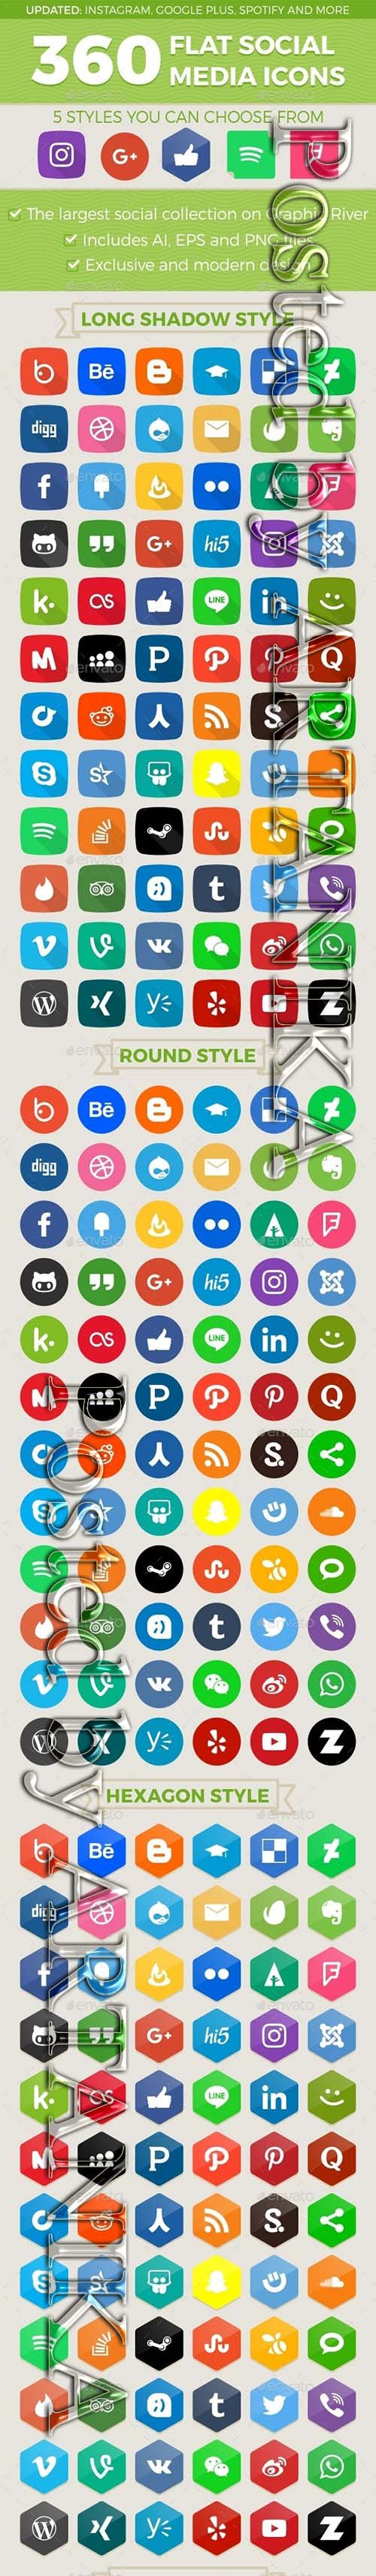 GraphicRiver - Social Media Icons 11988212